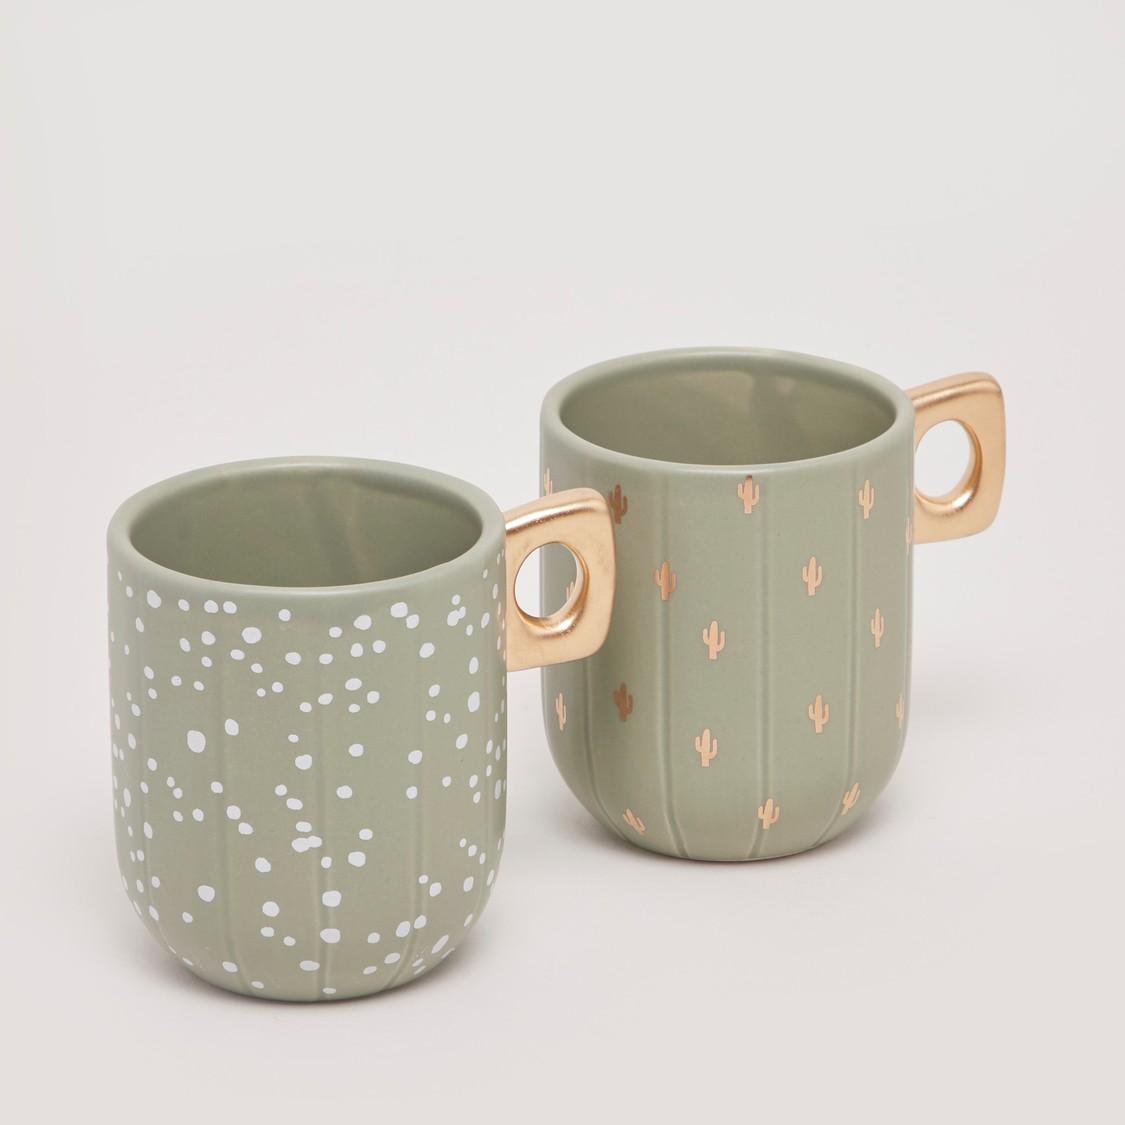 Set of 2 - Printed Mugs with Keyhole Handle